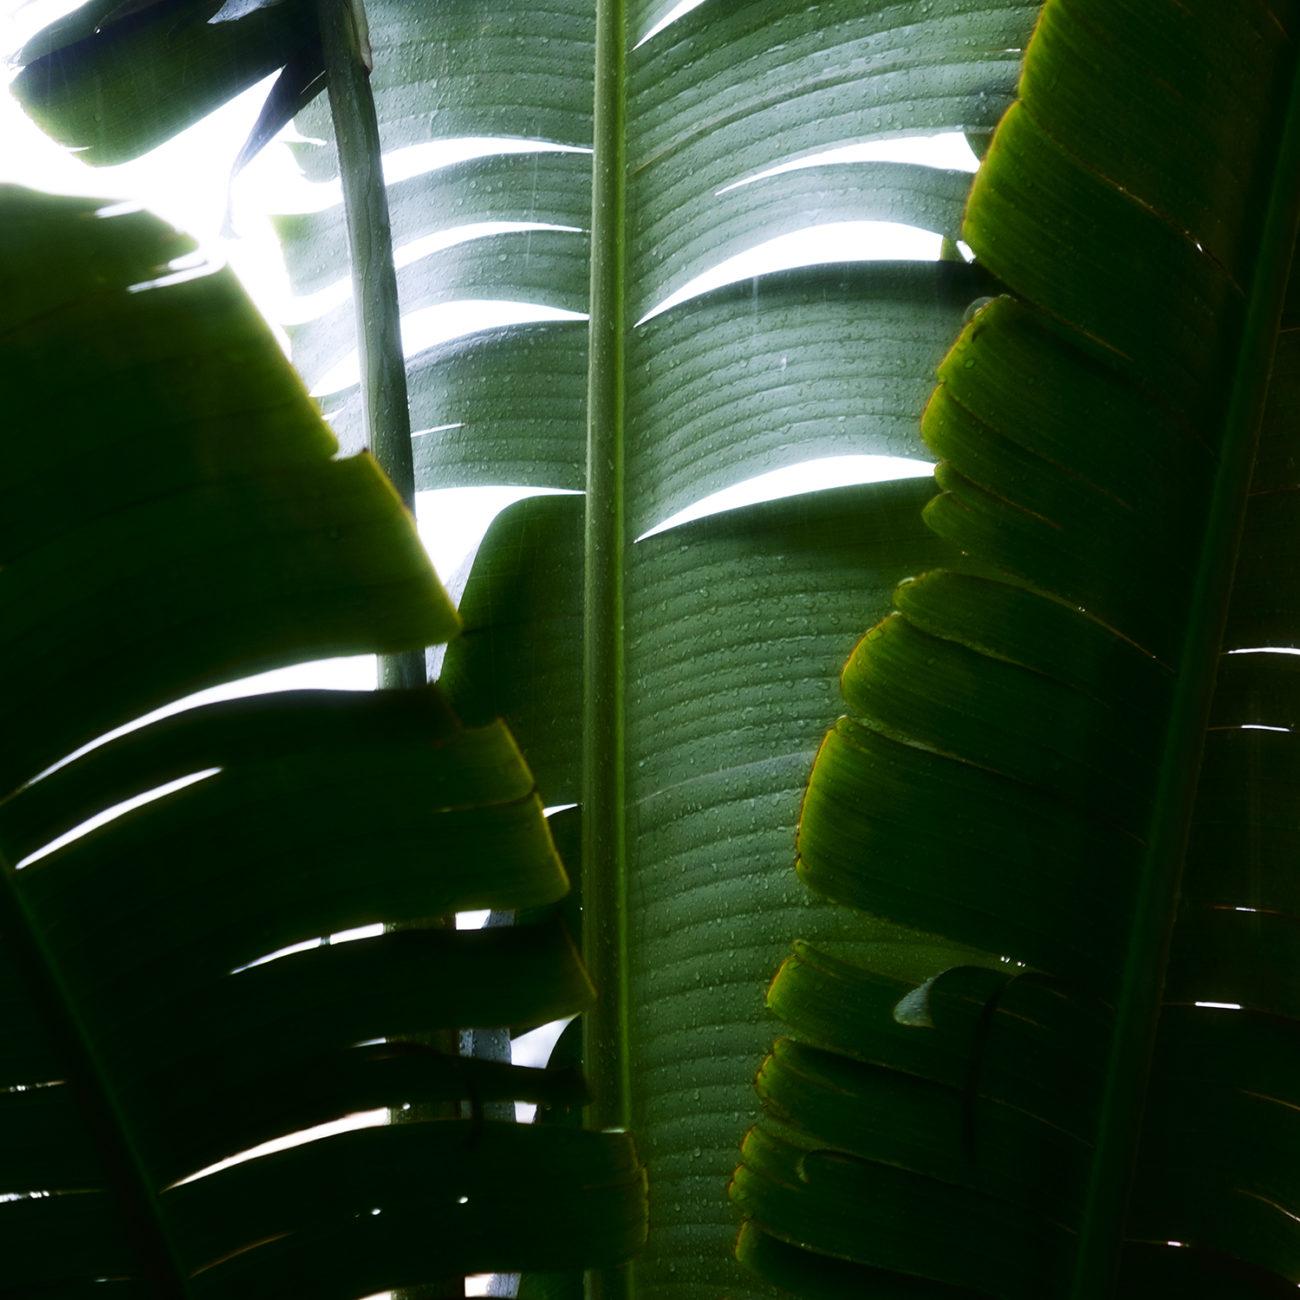 Banana palm leave in rain, Florida, 2017